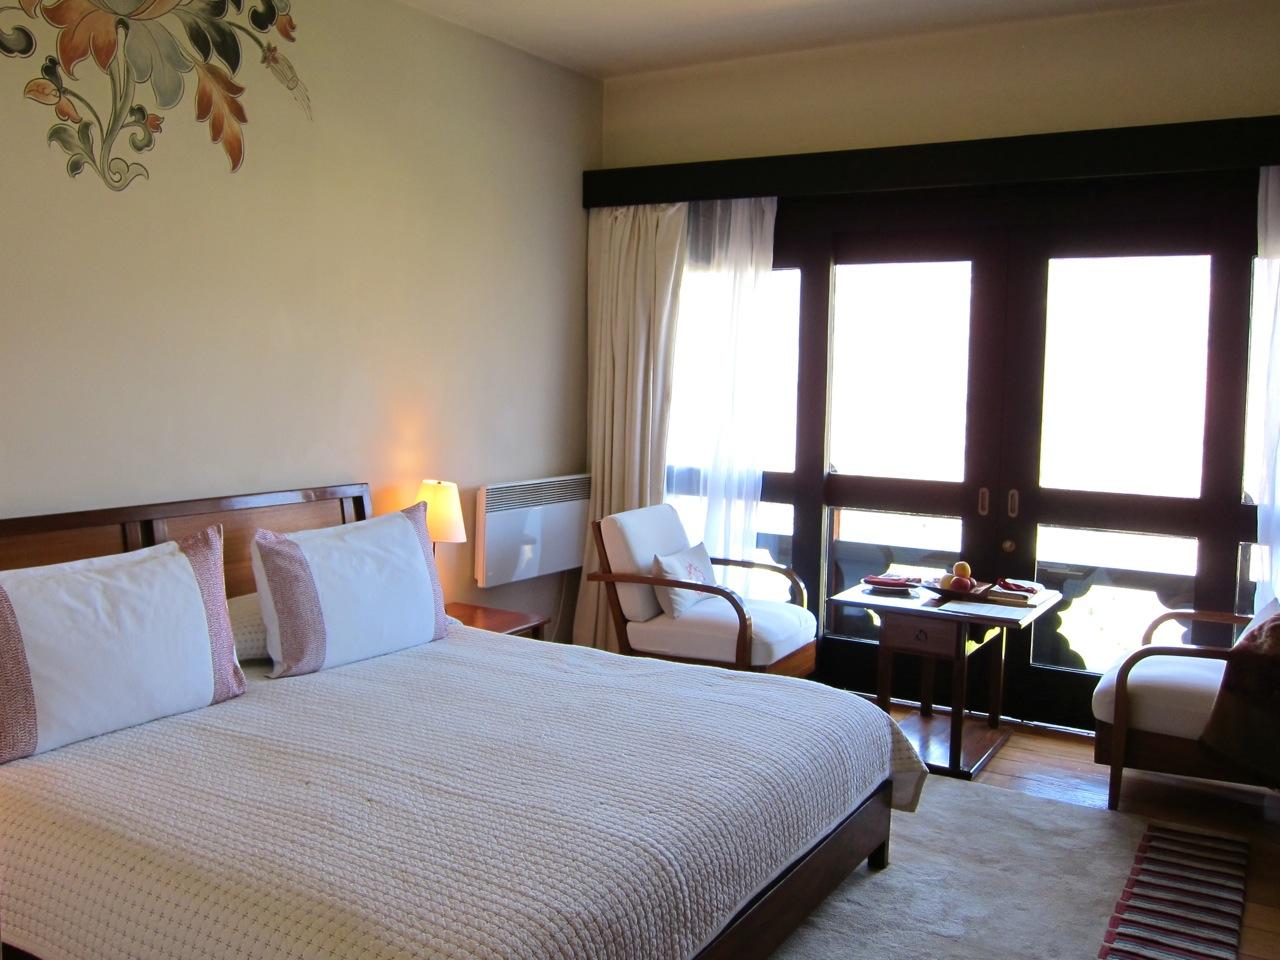 Hotel Rl Premium Vs Executive Room